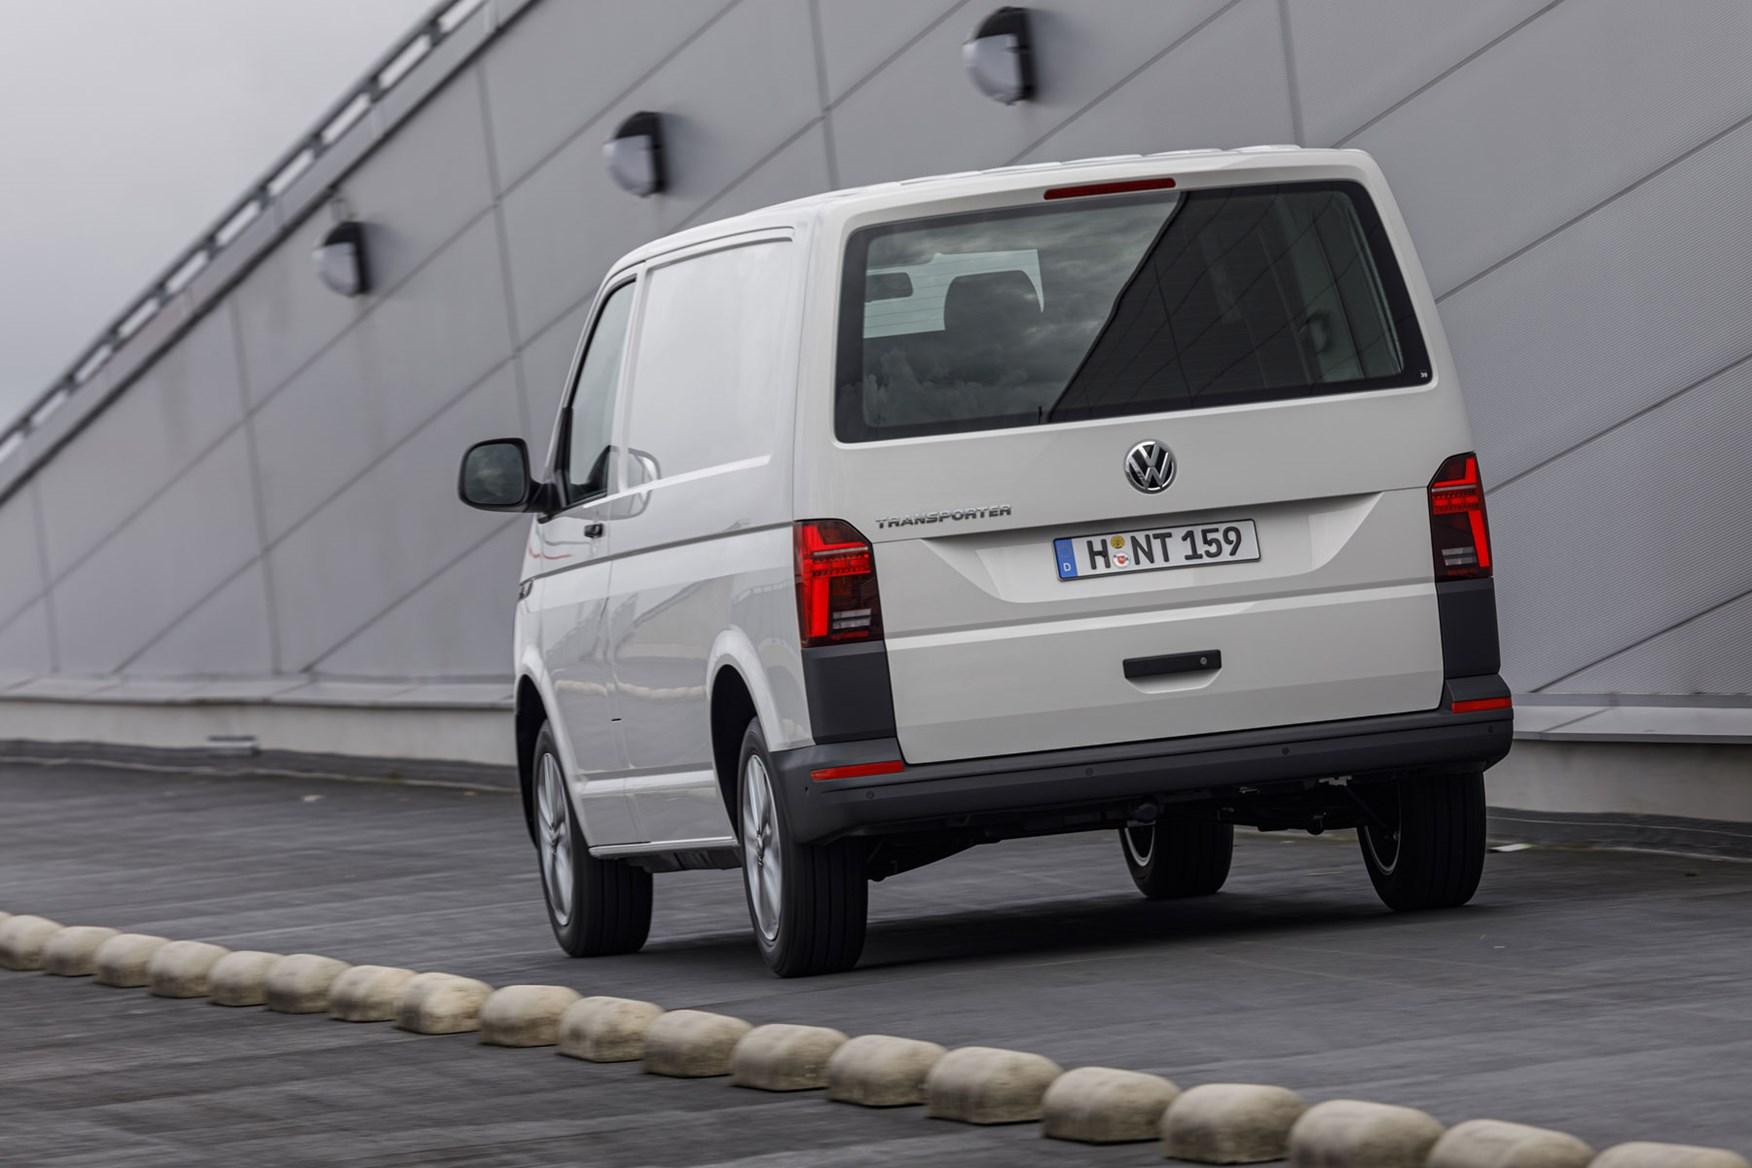 VW Transporter review - T6.1 2019 facelift, rear view, white